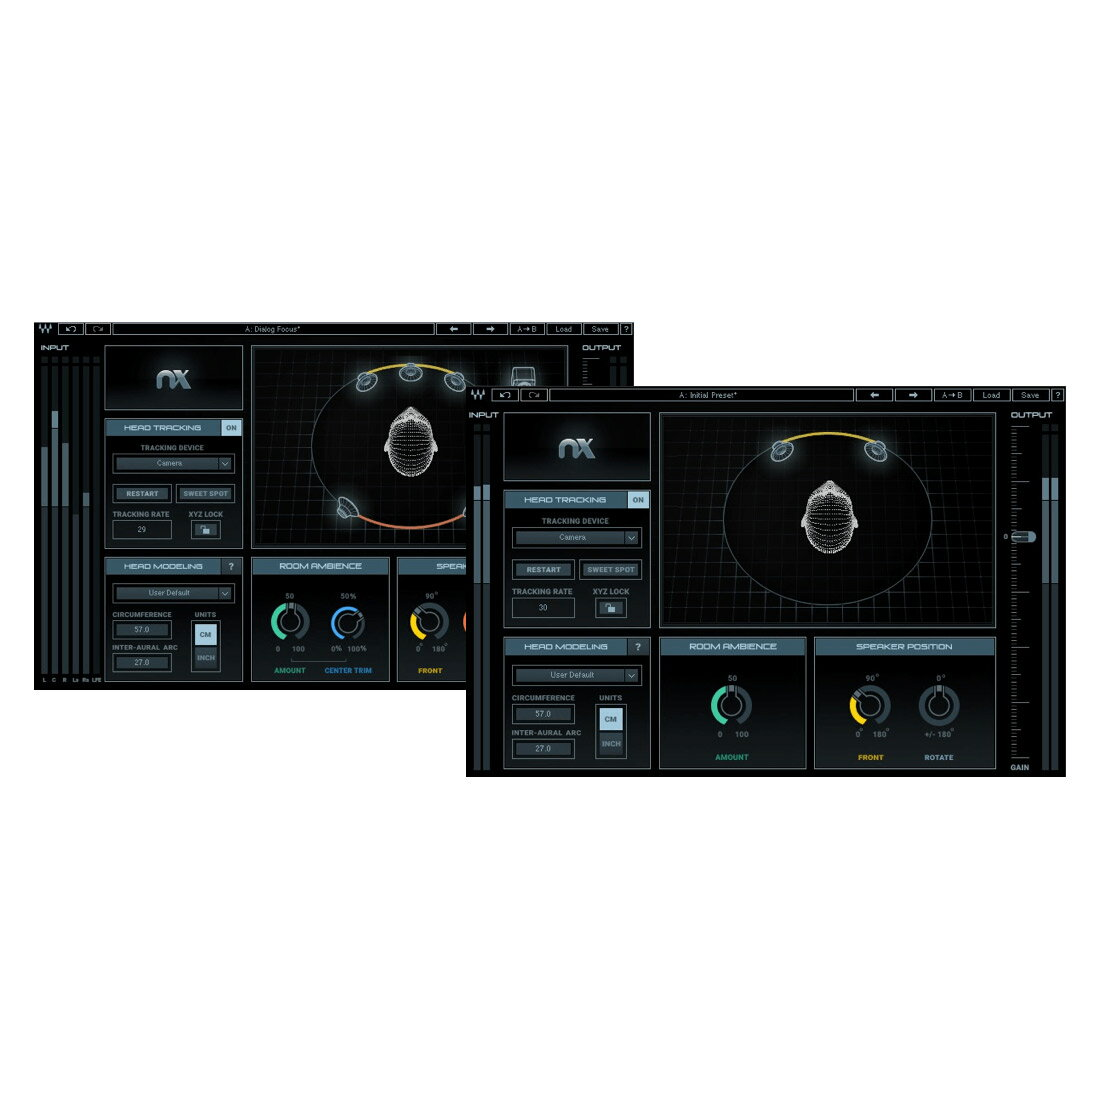 WAVES Nx - Virtual Mix Room over Headphones 【ウェーブス】[メール納品 代引き不可]画像